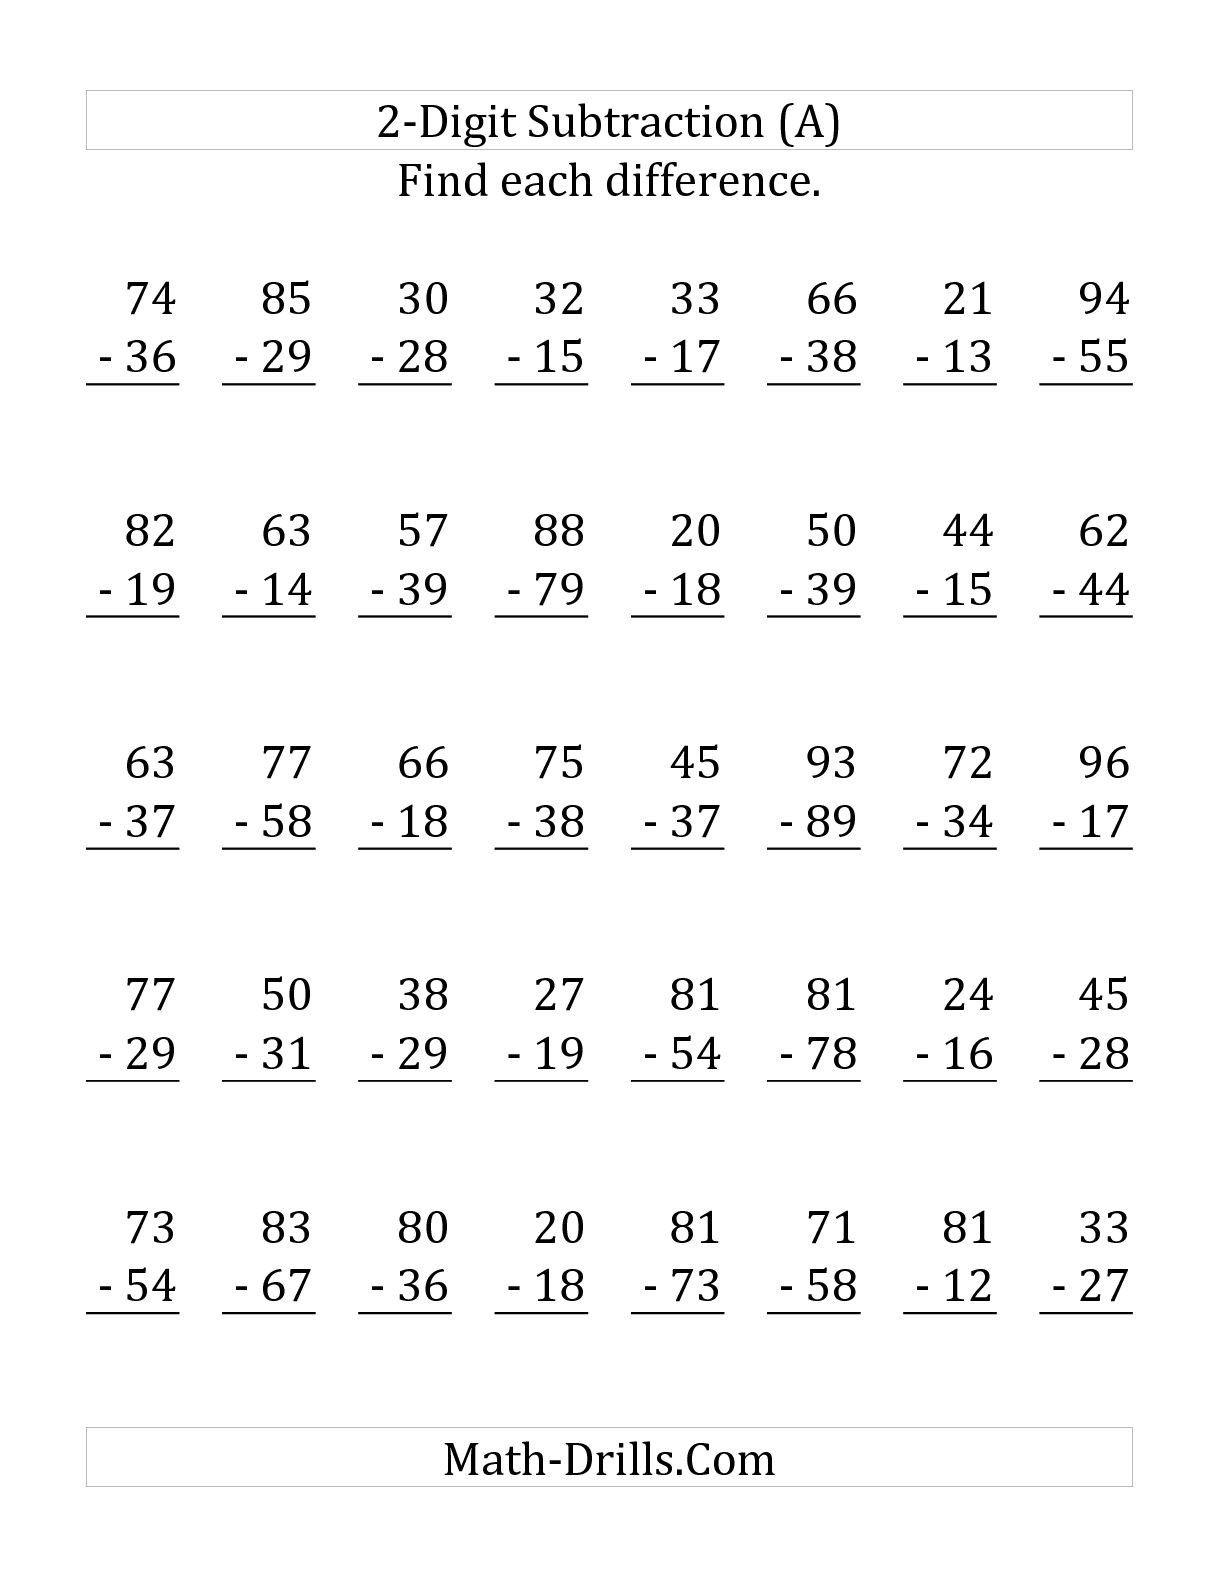 20 Worksheets Subtracting 2 Digit Numbers Math Worksheets